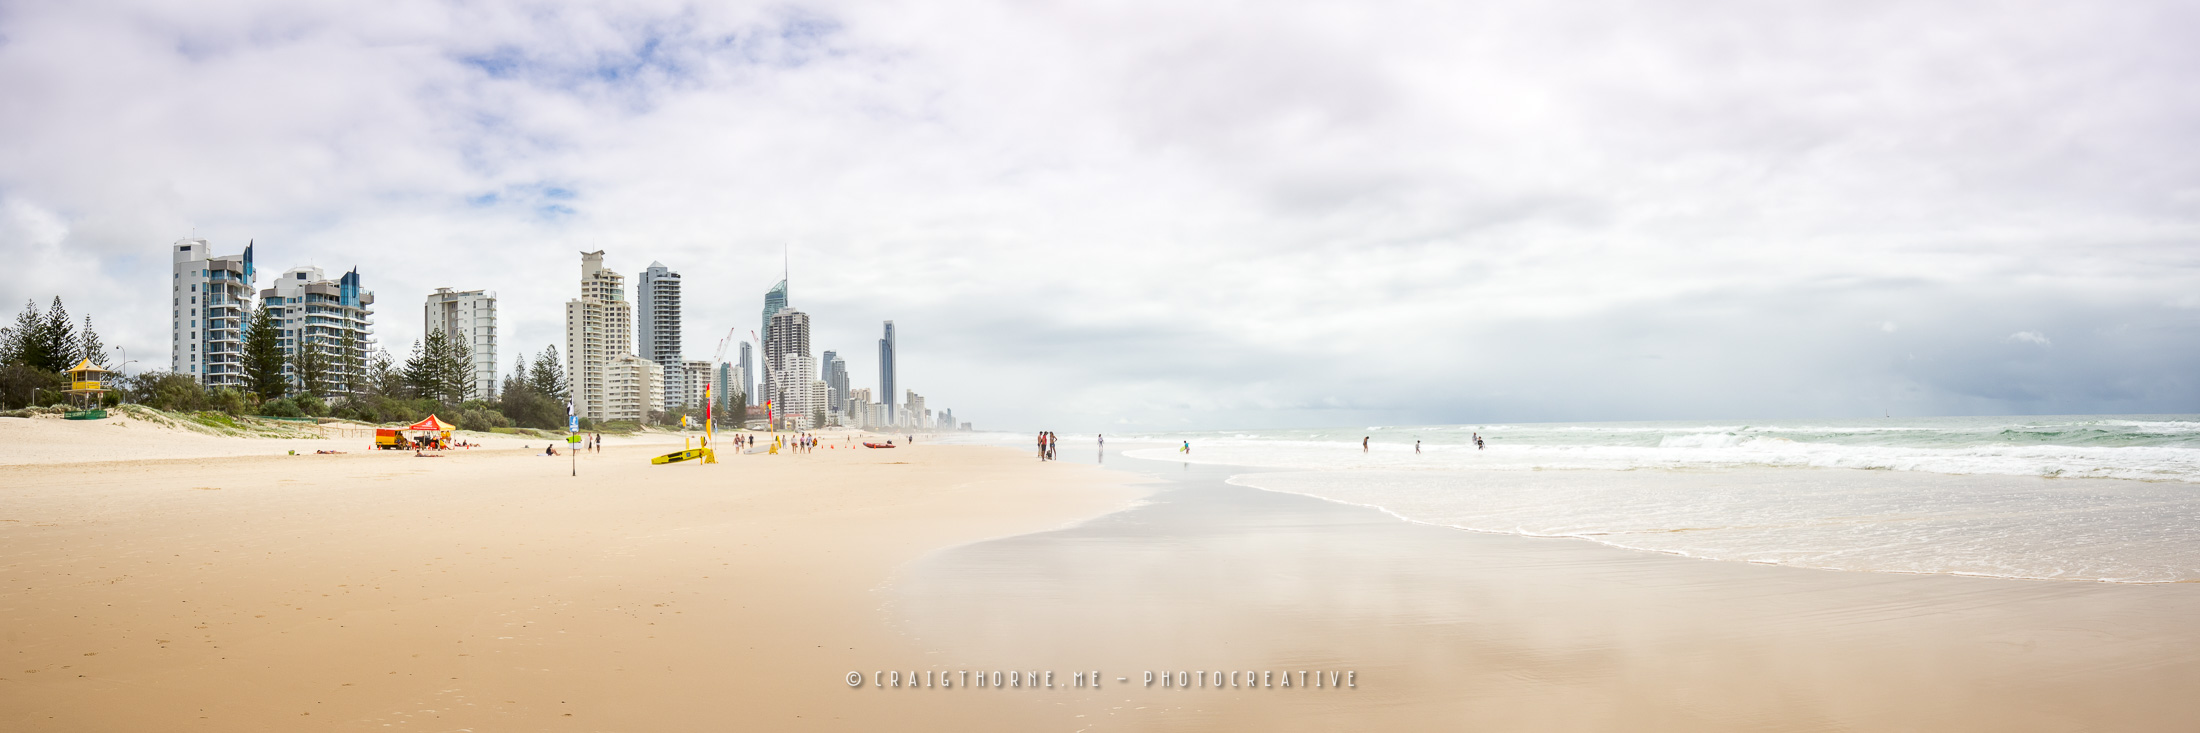 20170325-55-Panoramas-by-Craig-Thorne-THN_0478.jpg